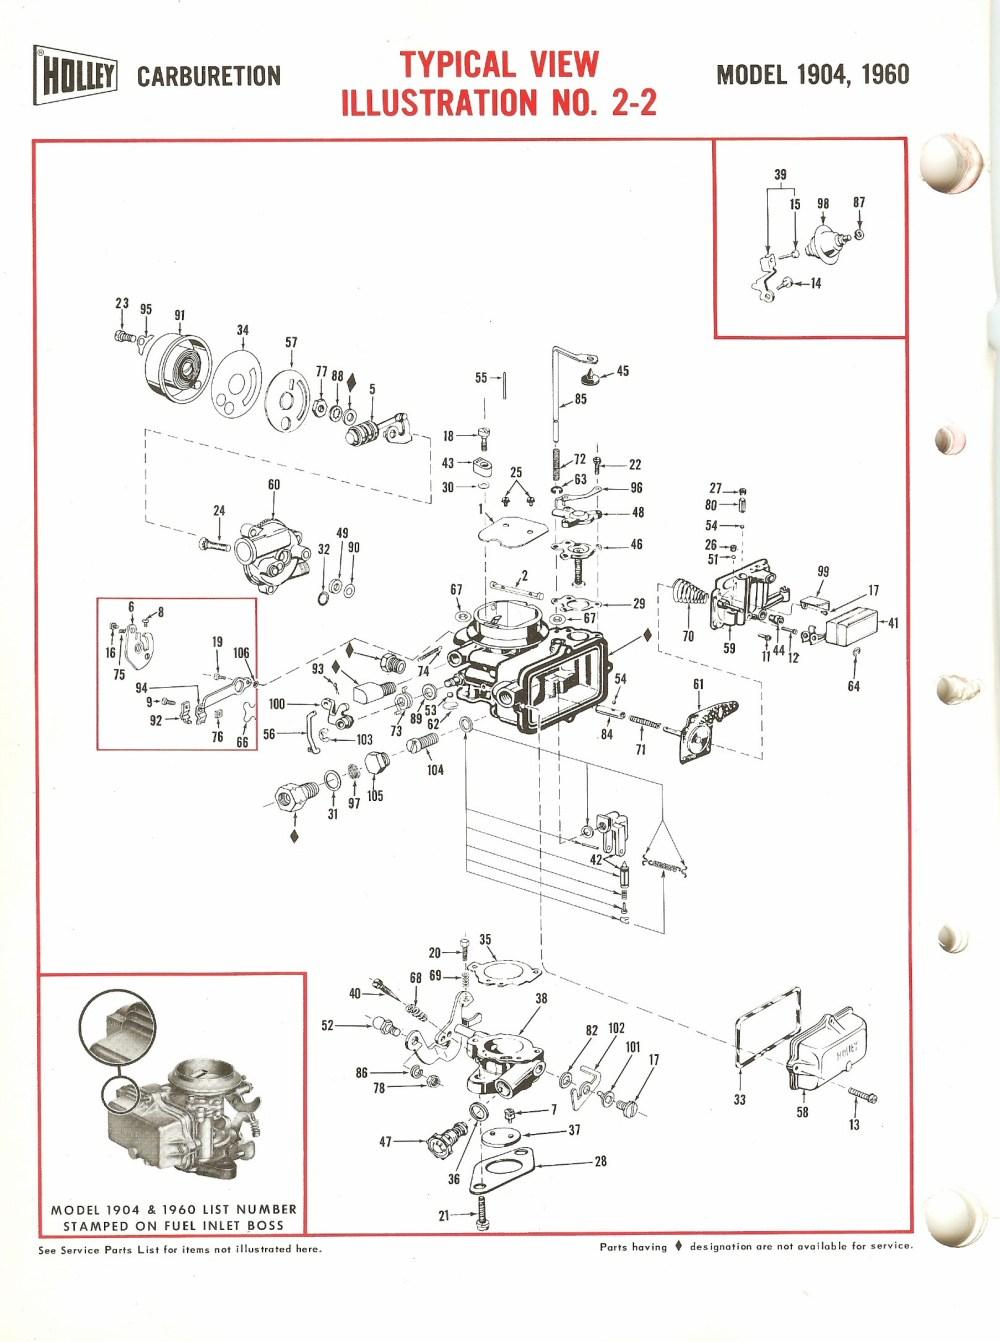 medium resolution of holley carburetor diagram wiring diagram for you holley carburetor exploded diagrams holley 1904 1906 exploded